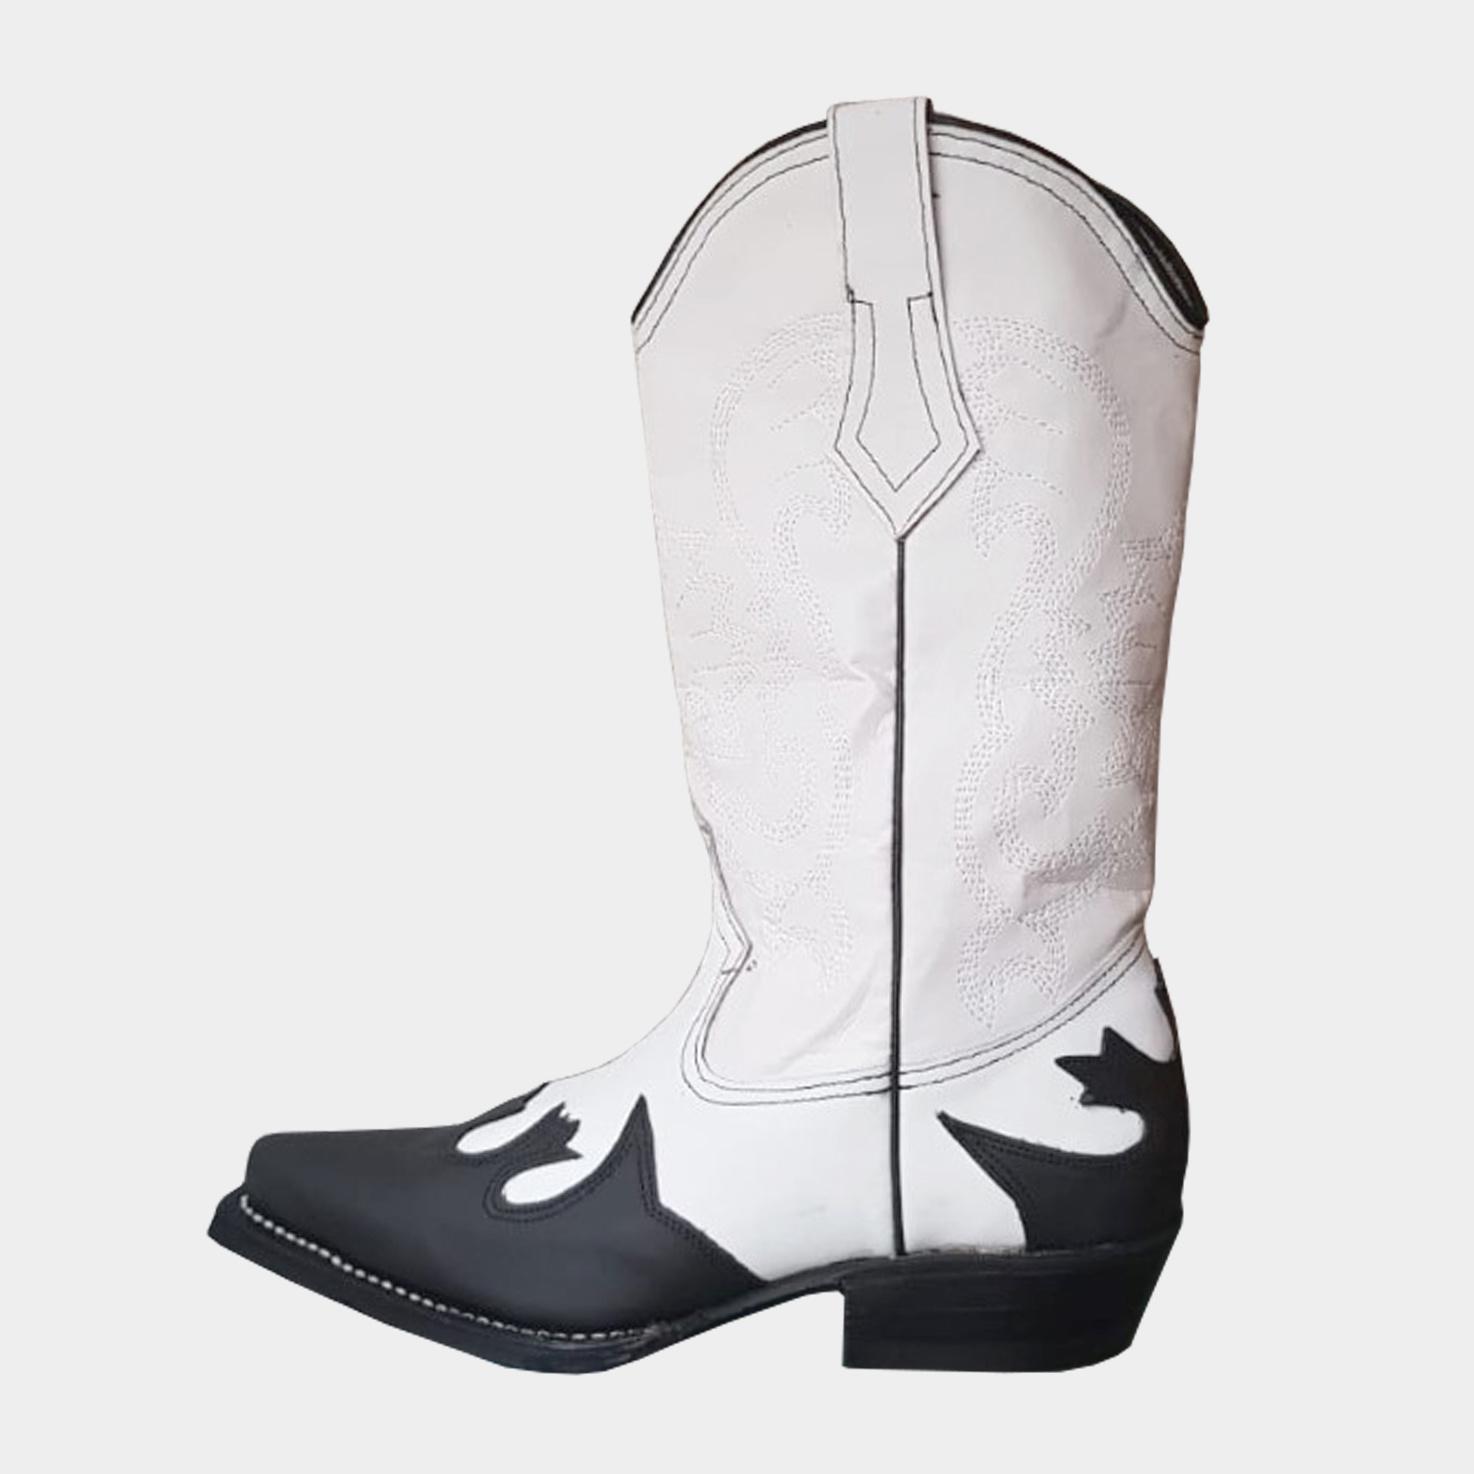 Milo Cowboy Laarzen - Zwart/Wit